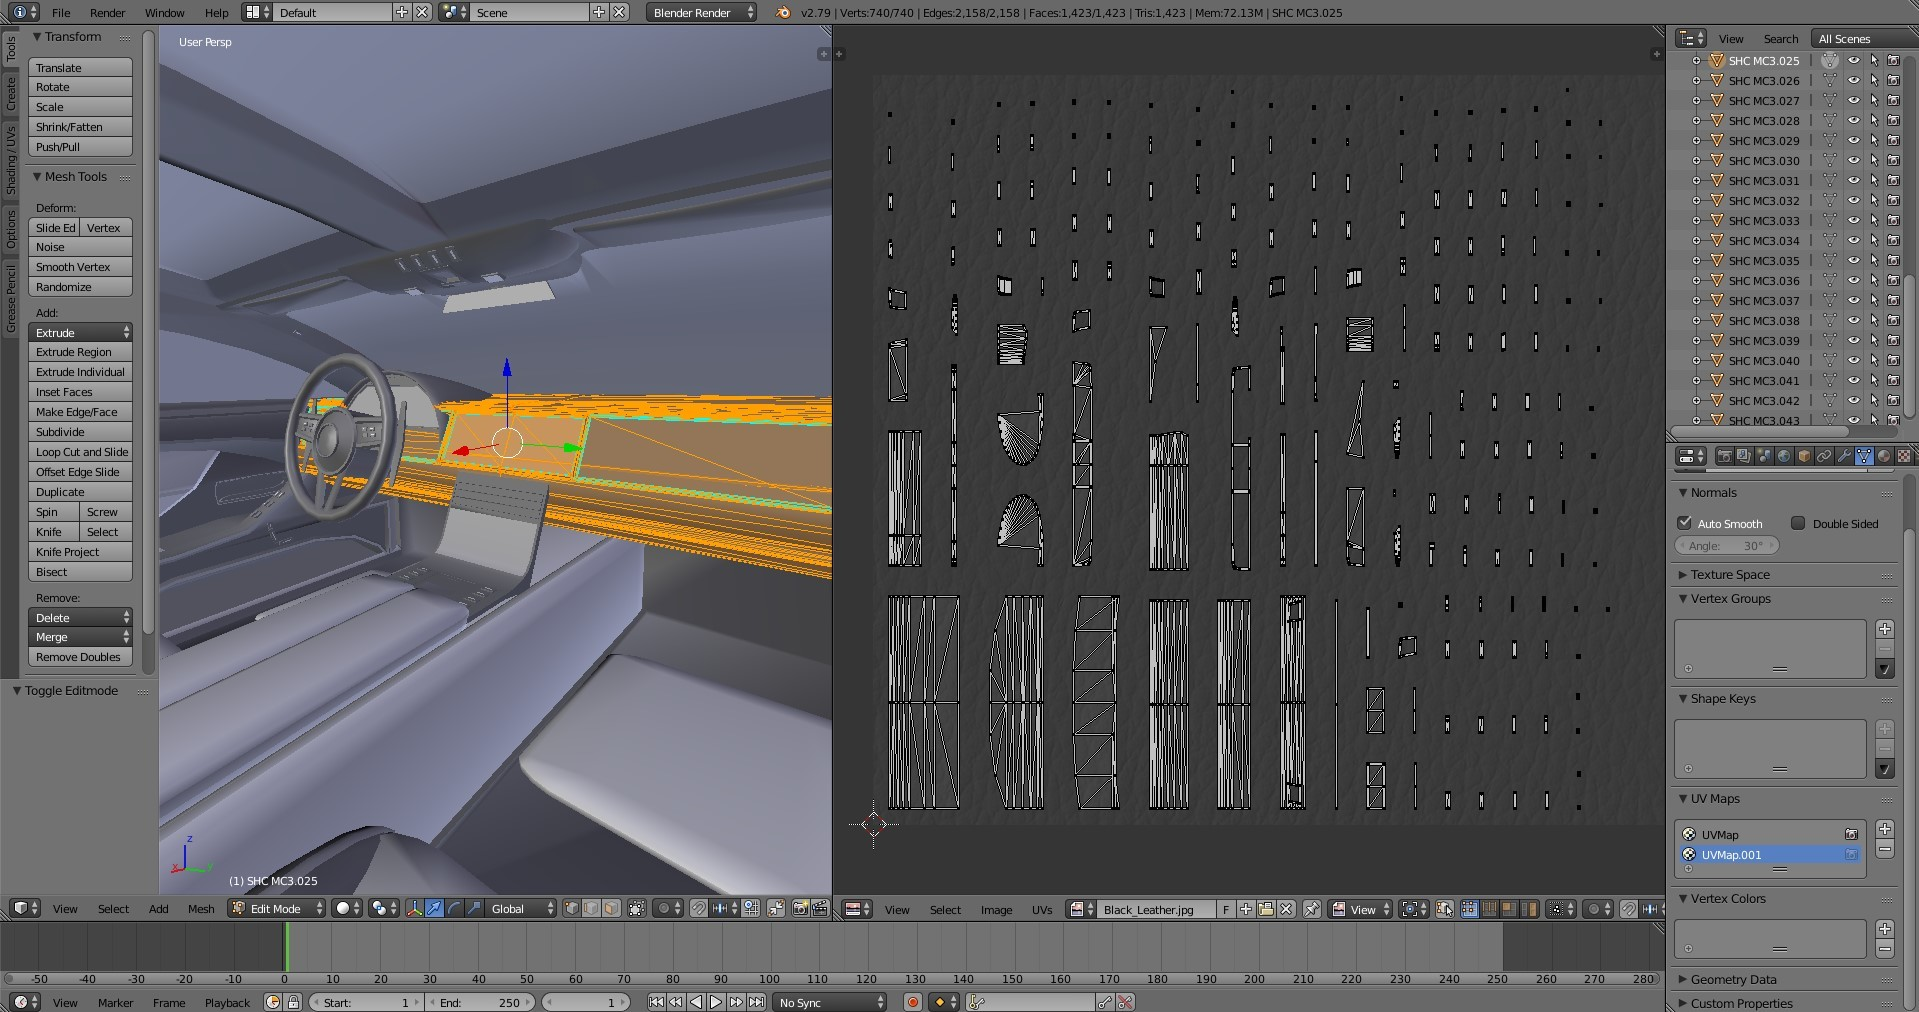 Dennis wormgoor screenshot 6